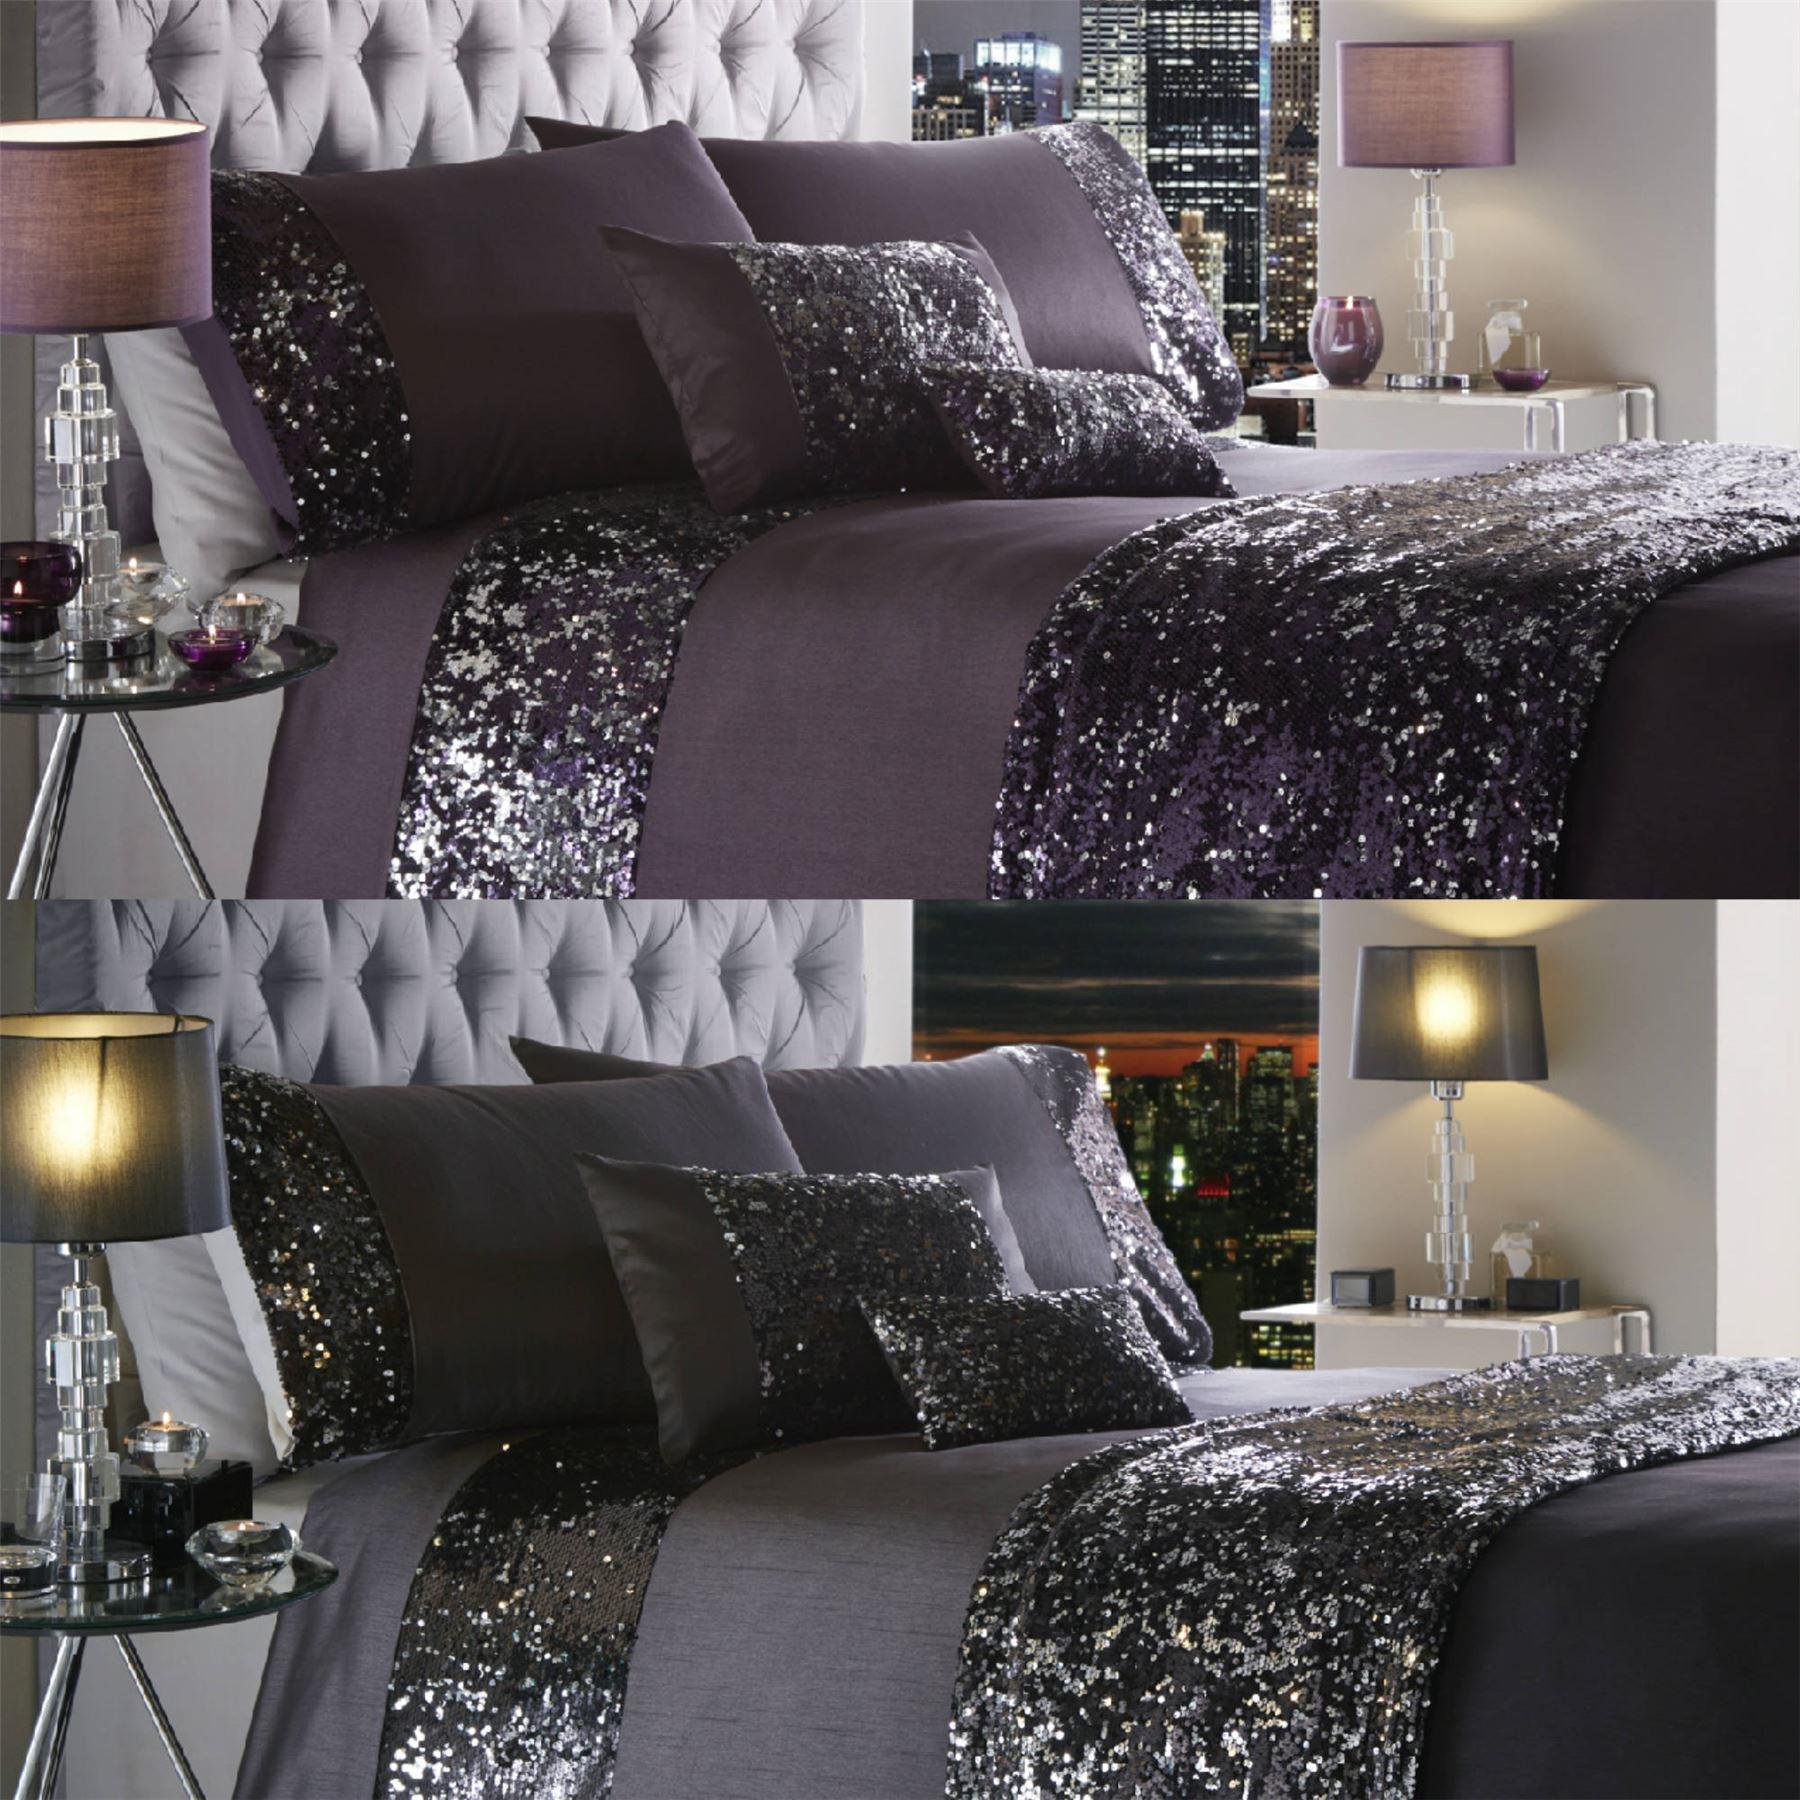 Luxury Sequin Duvet Quilt Cover Bedding Set Dazzle New Ebay